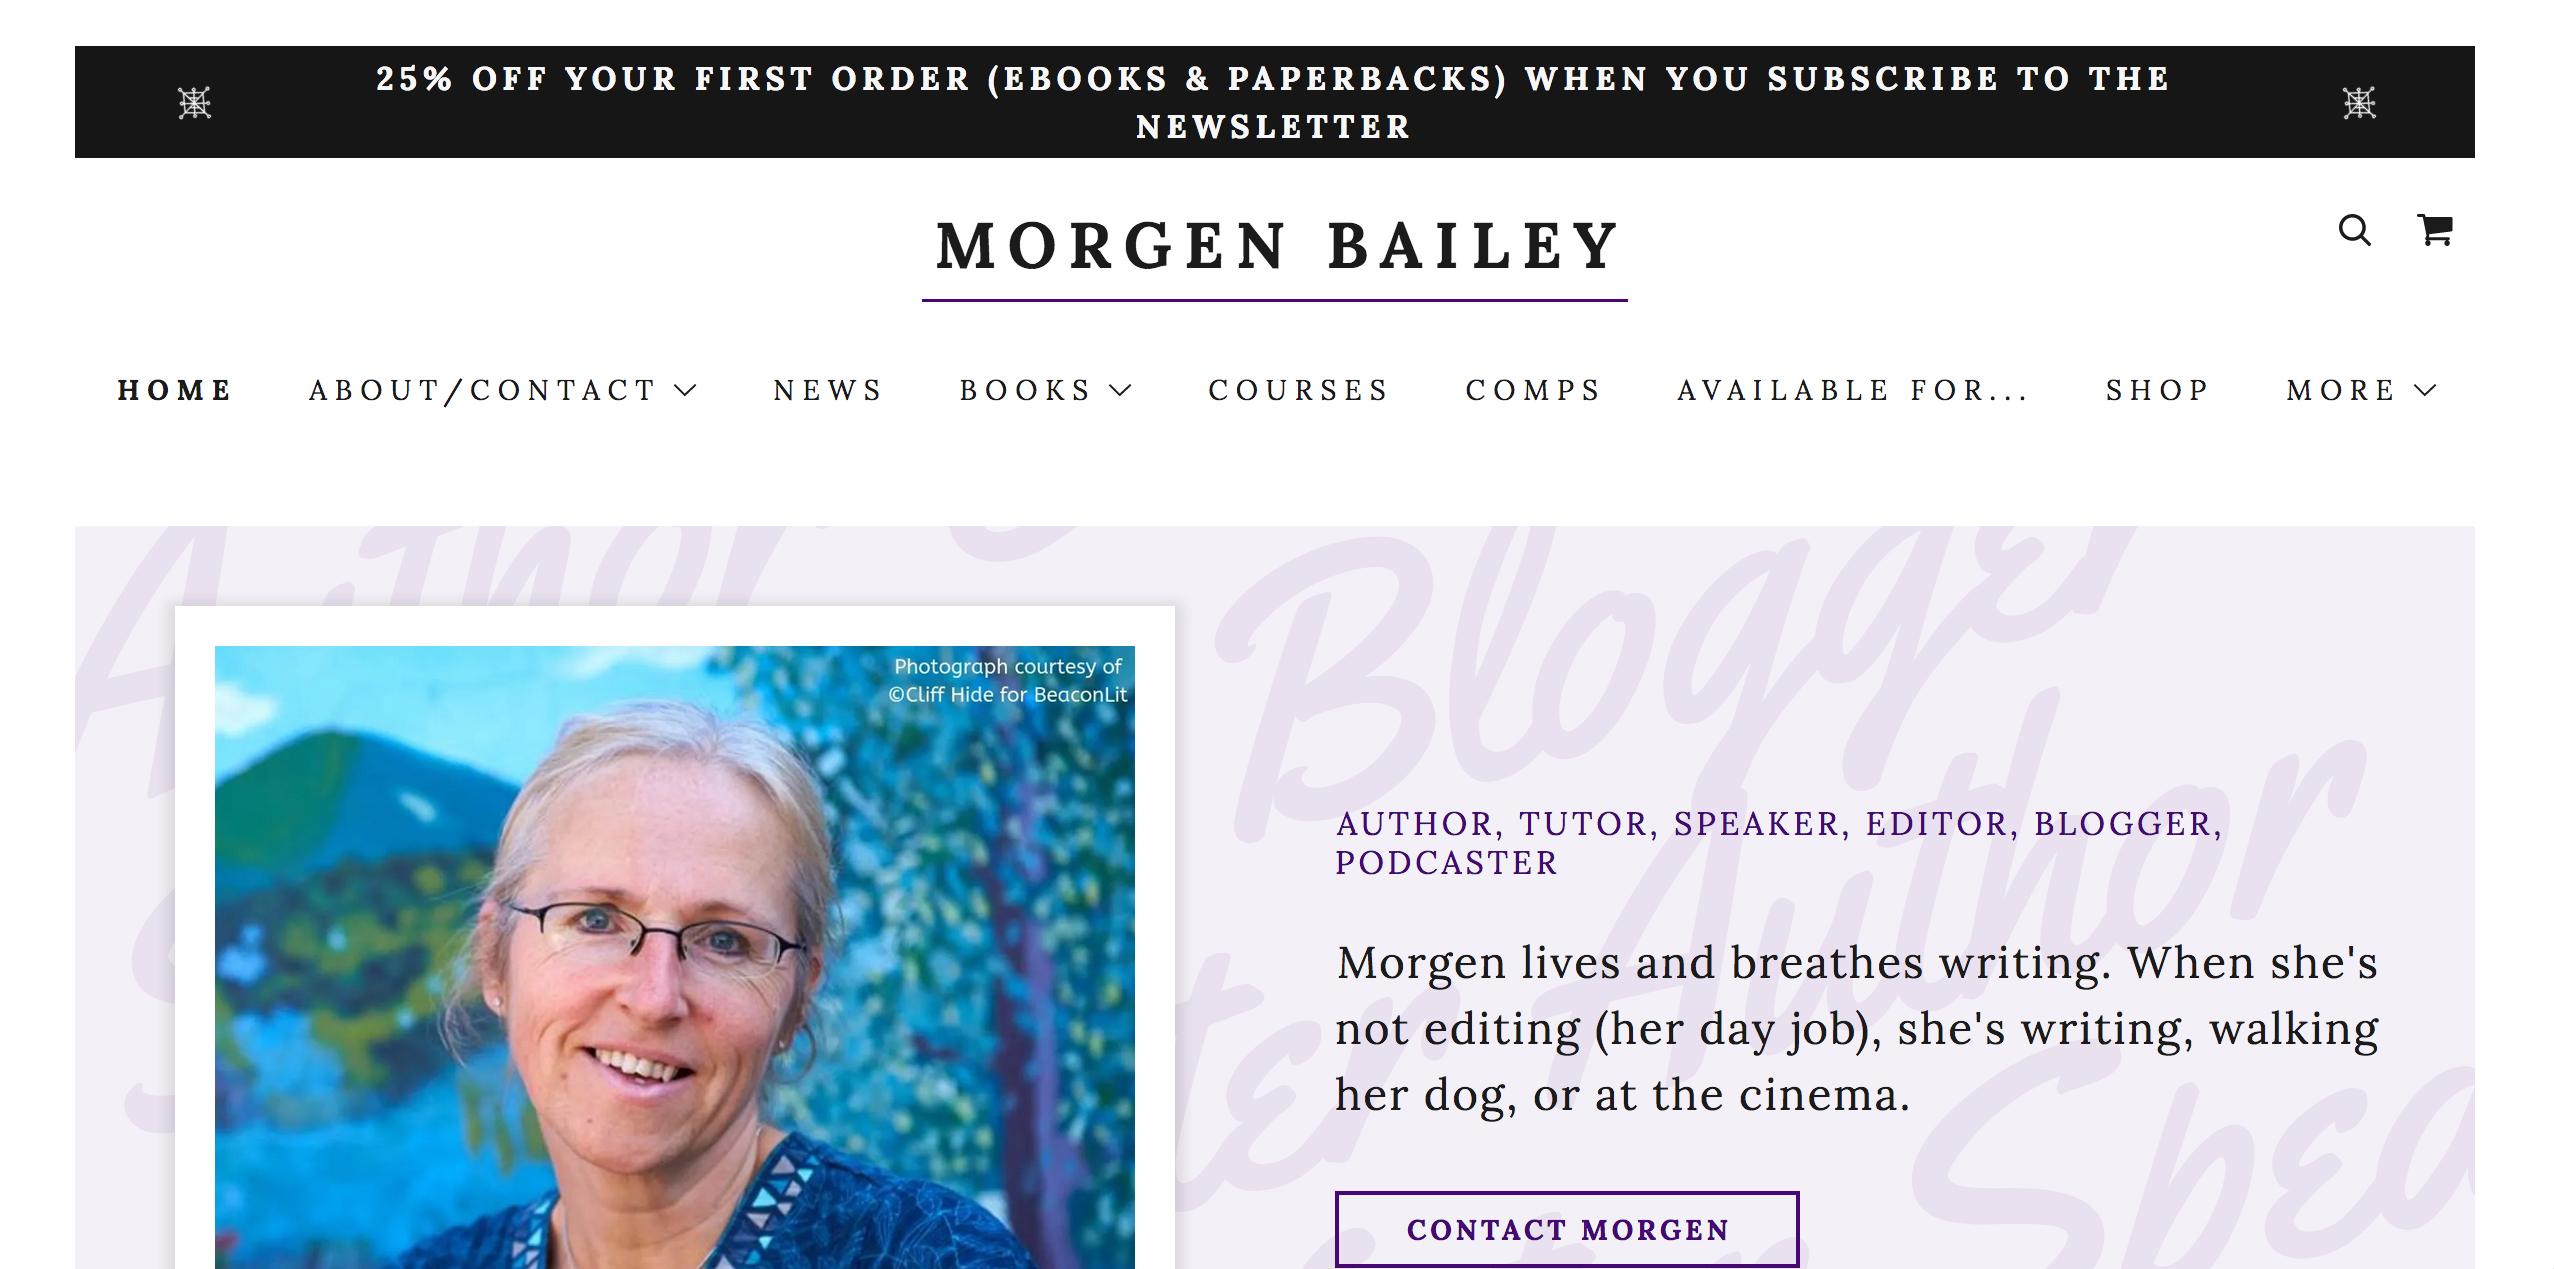 www.morgenbailey.com